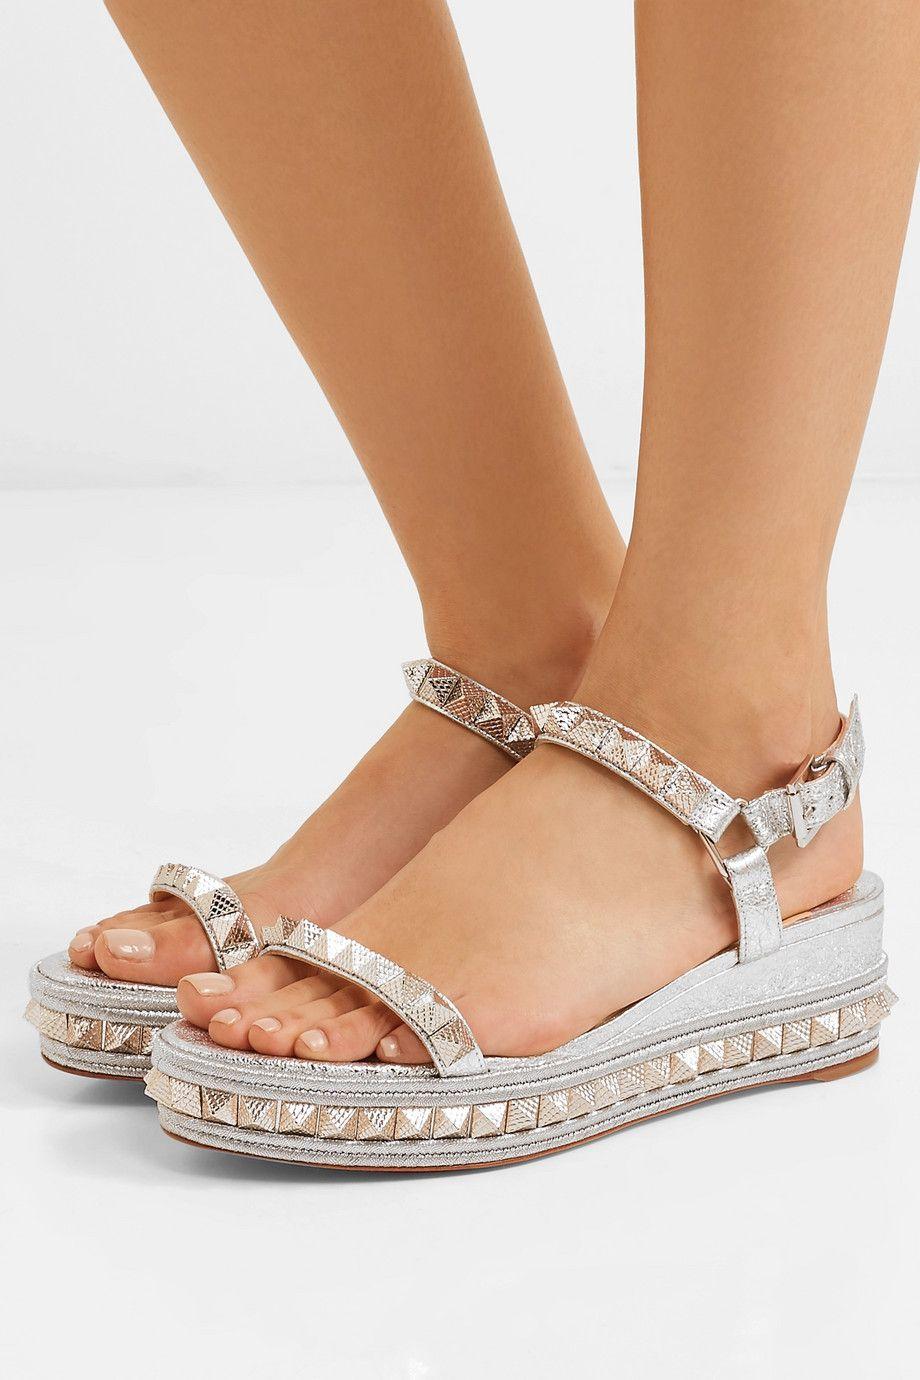 Heißer verkauf- roten boden sommer sandalen pyraclou versetzt metallic frauen keil sandalen high heels knöchelriemen nieten slingback eur 35-42